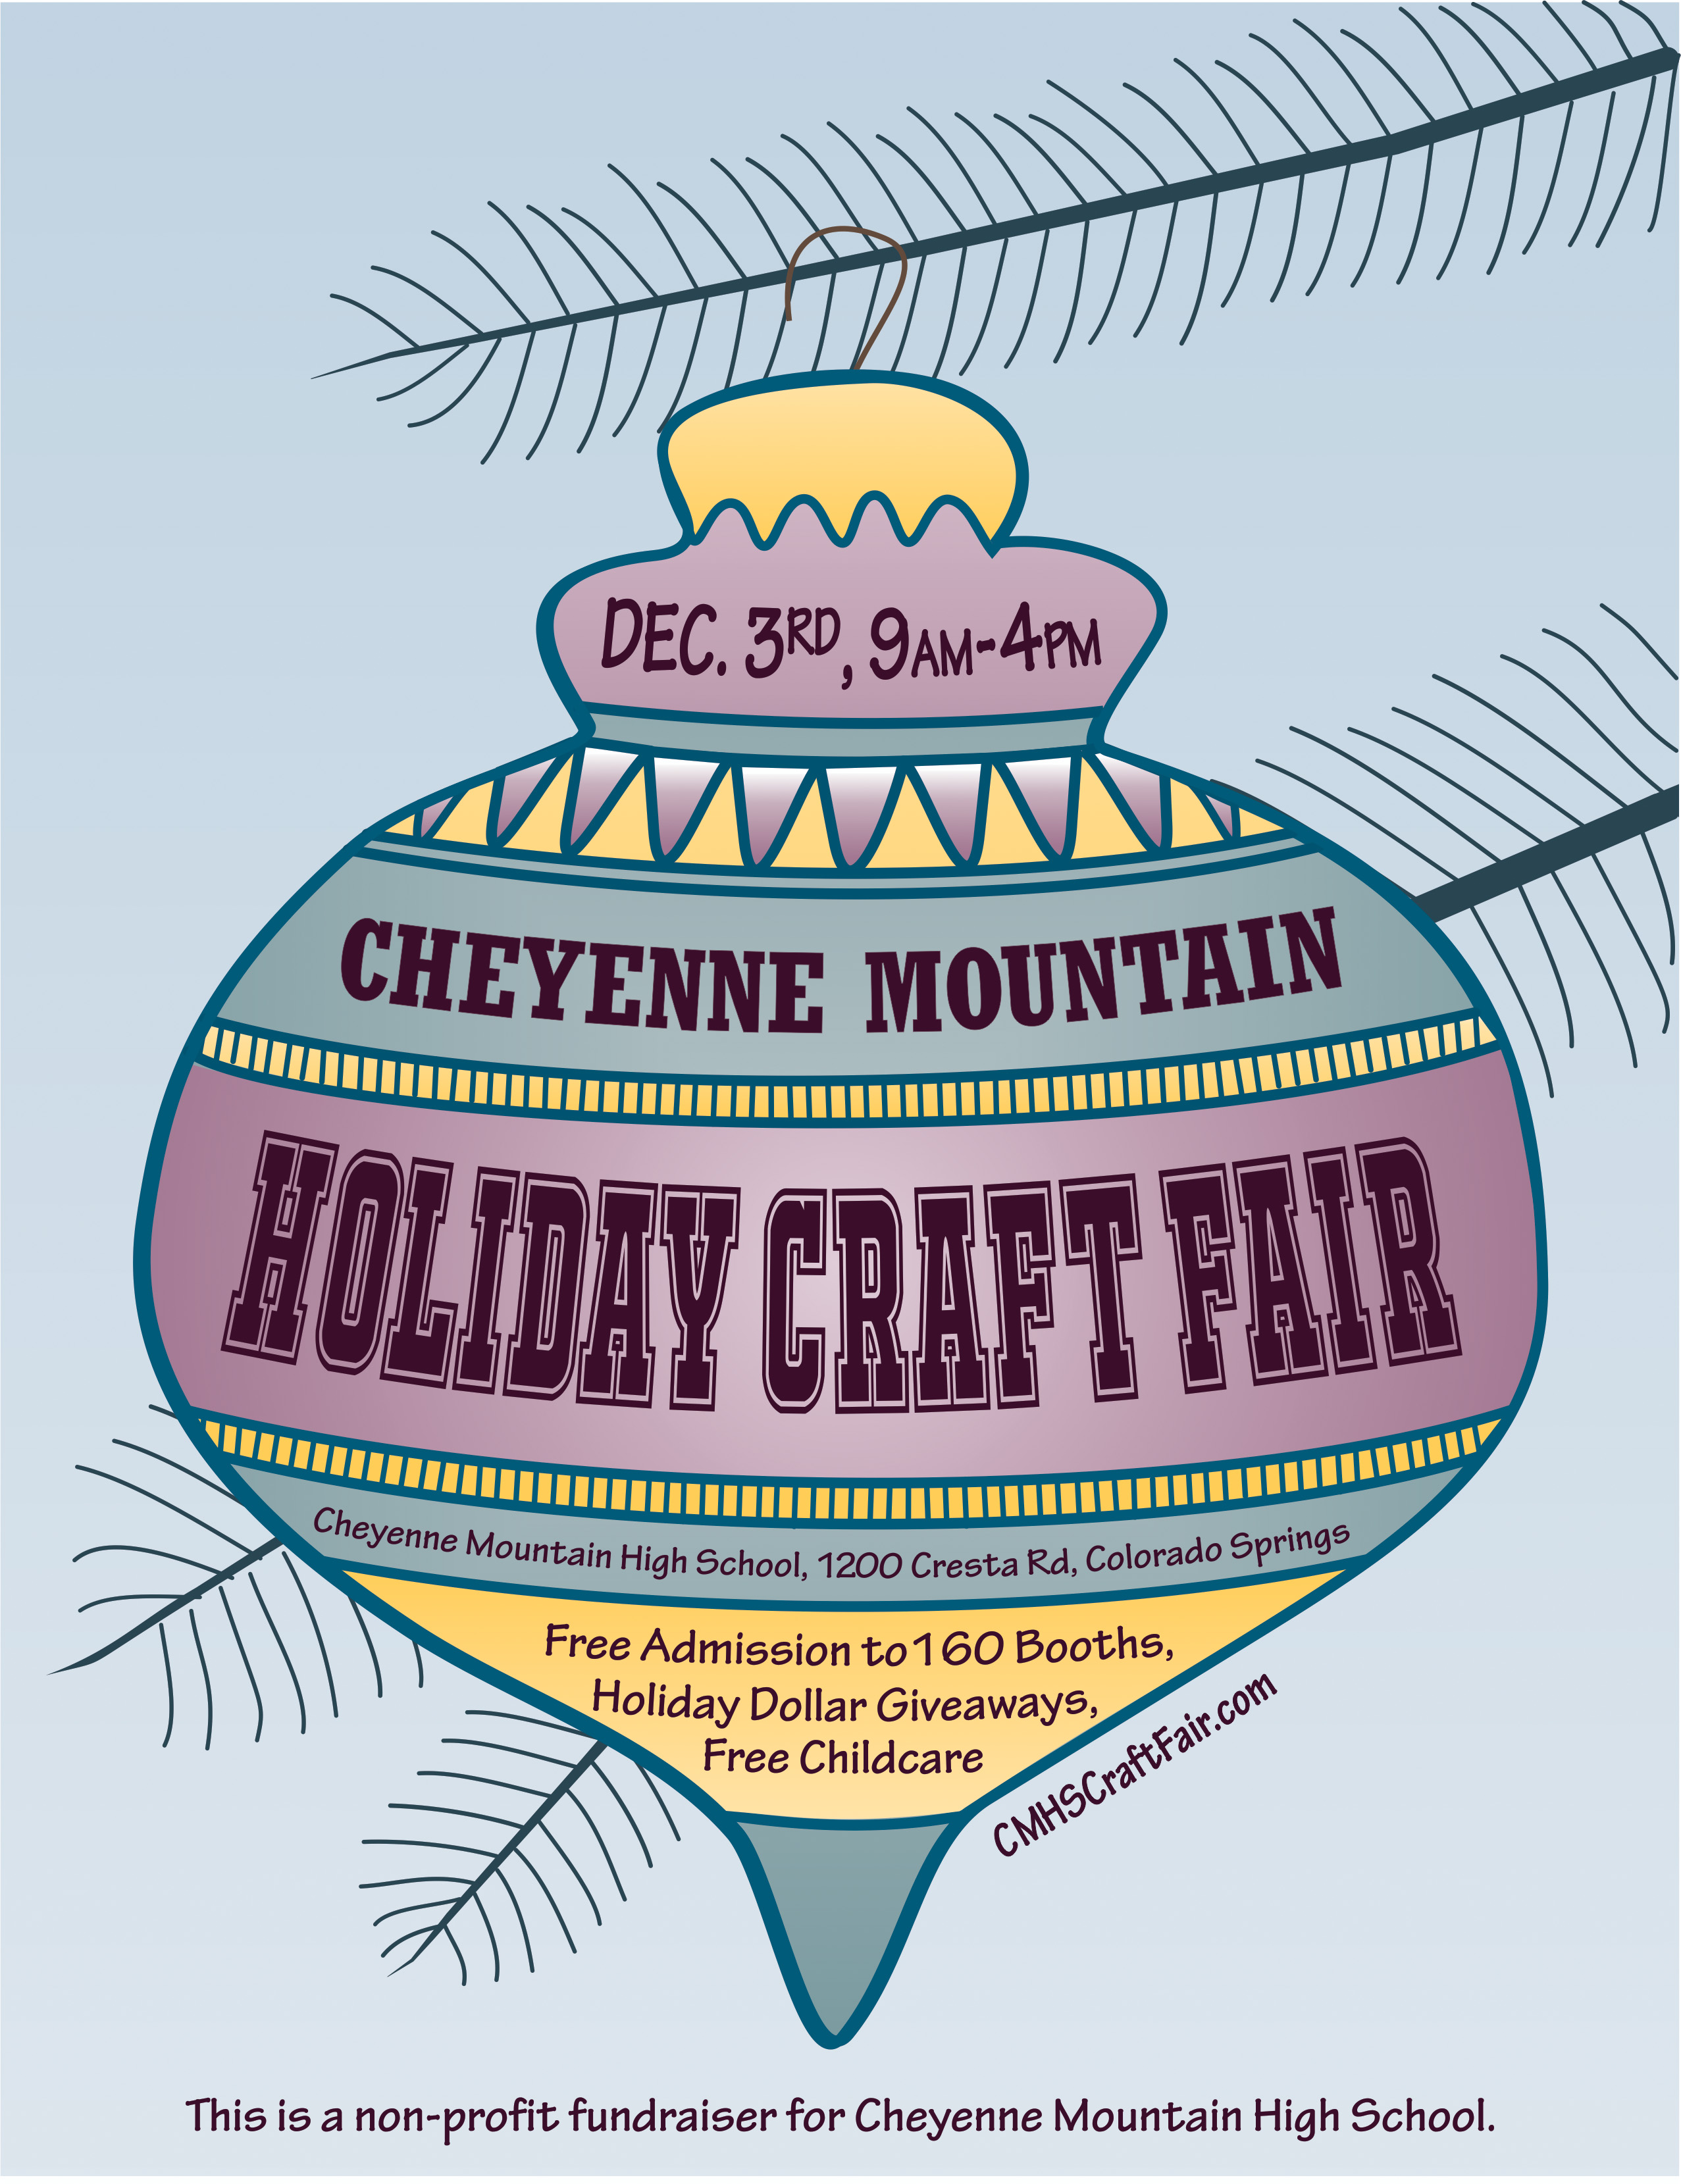 Cheyenne Mountain High School Craft Fair